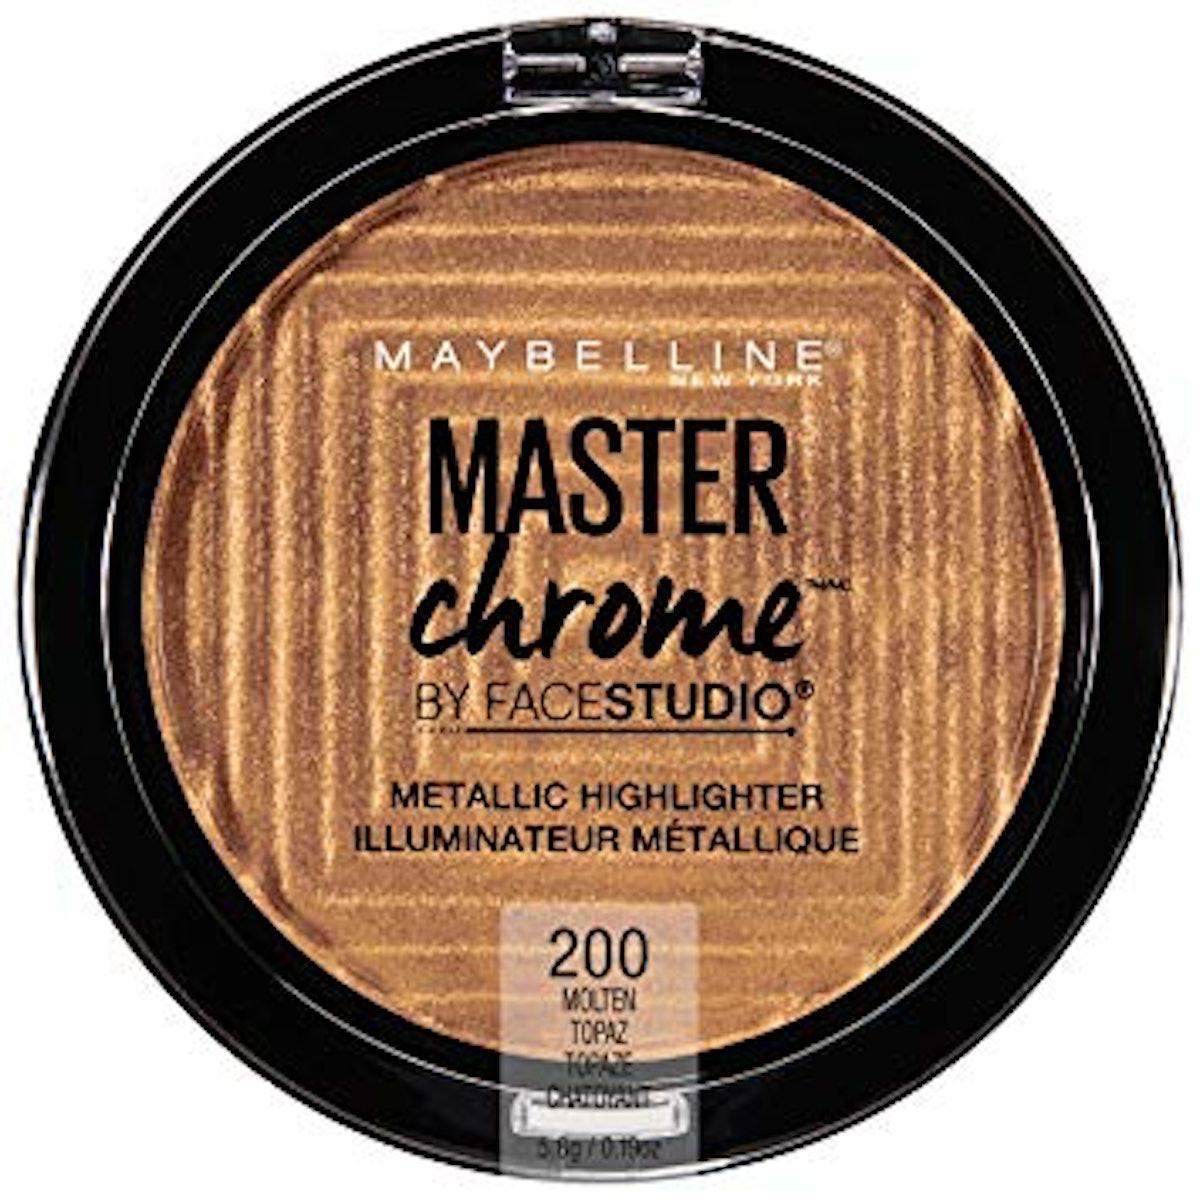 FaceStudio MasterChrome Metallic Highlighter